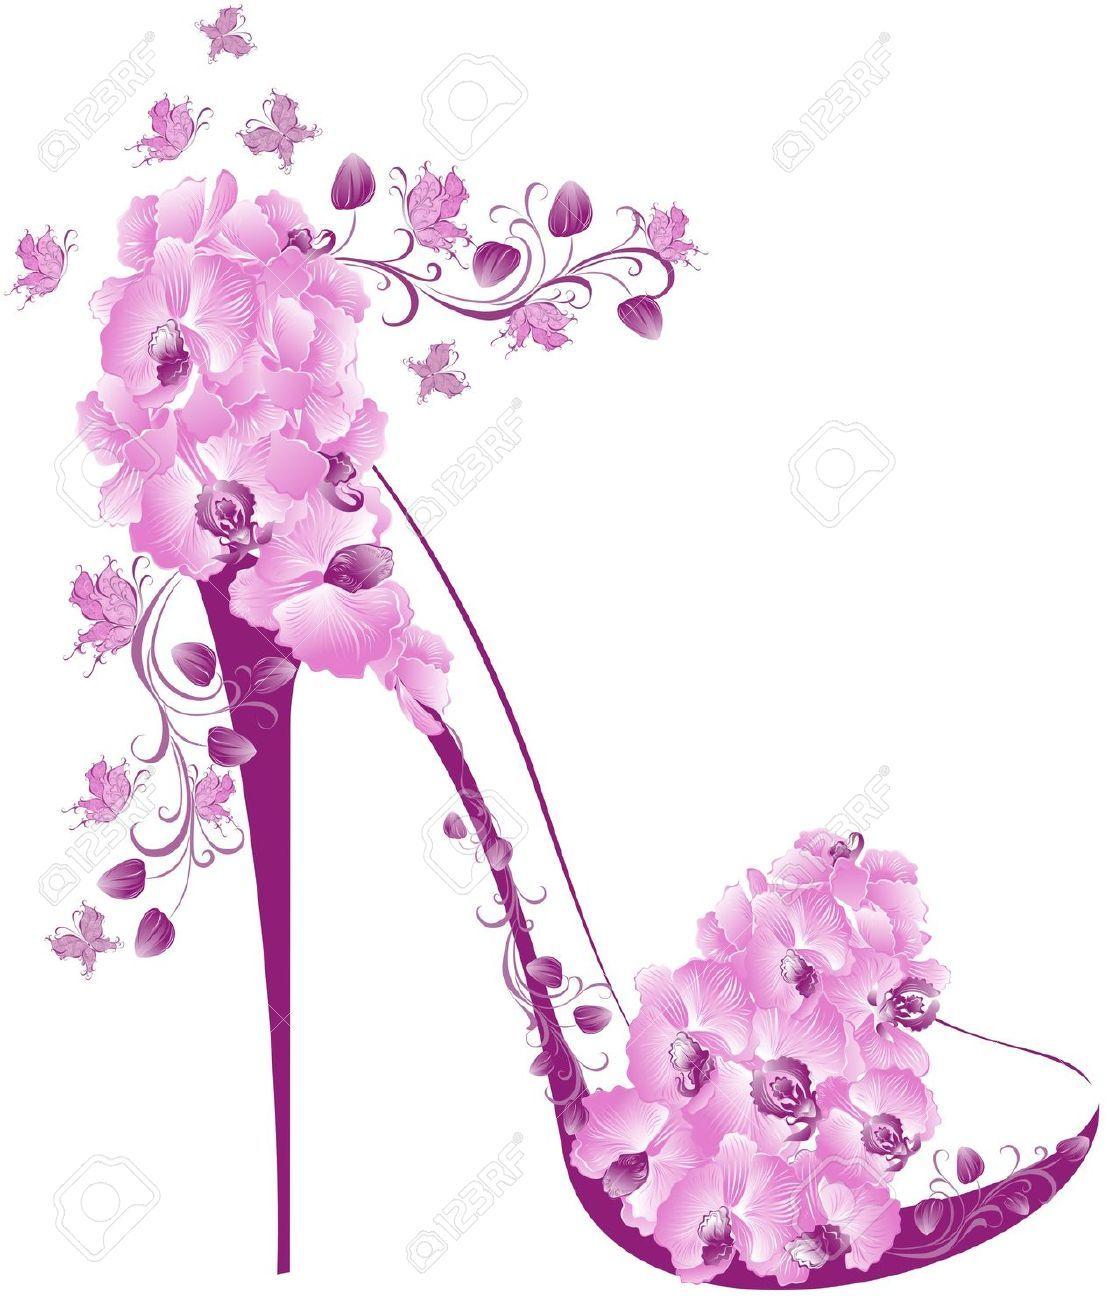 Pink High Heel Shoes Clipart Images Art Pinterest Shoes Shoes